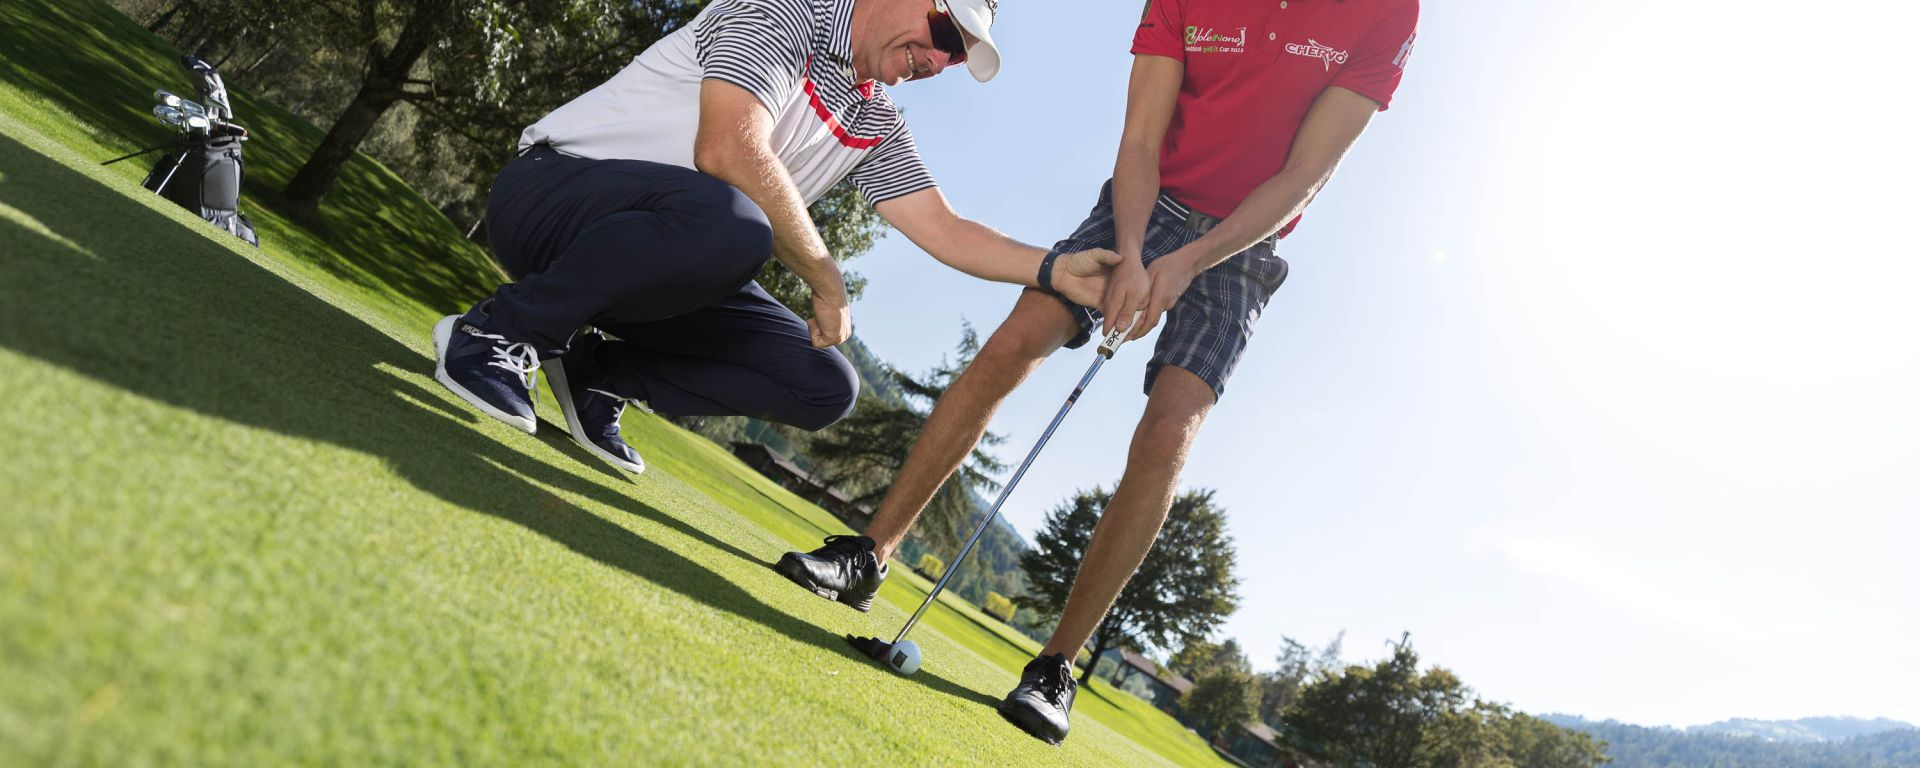 Quellenhof Golf-Abgabe-WEB-087-116.jpg